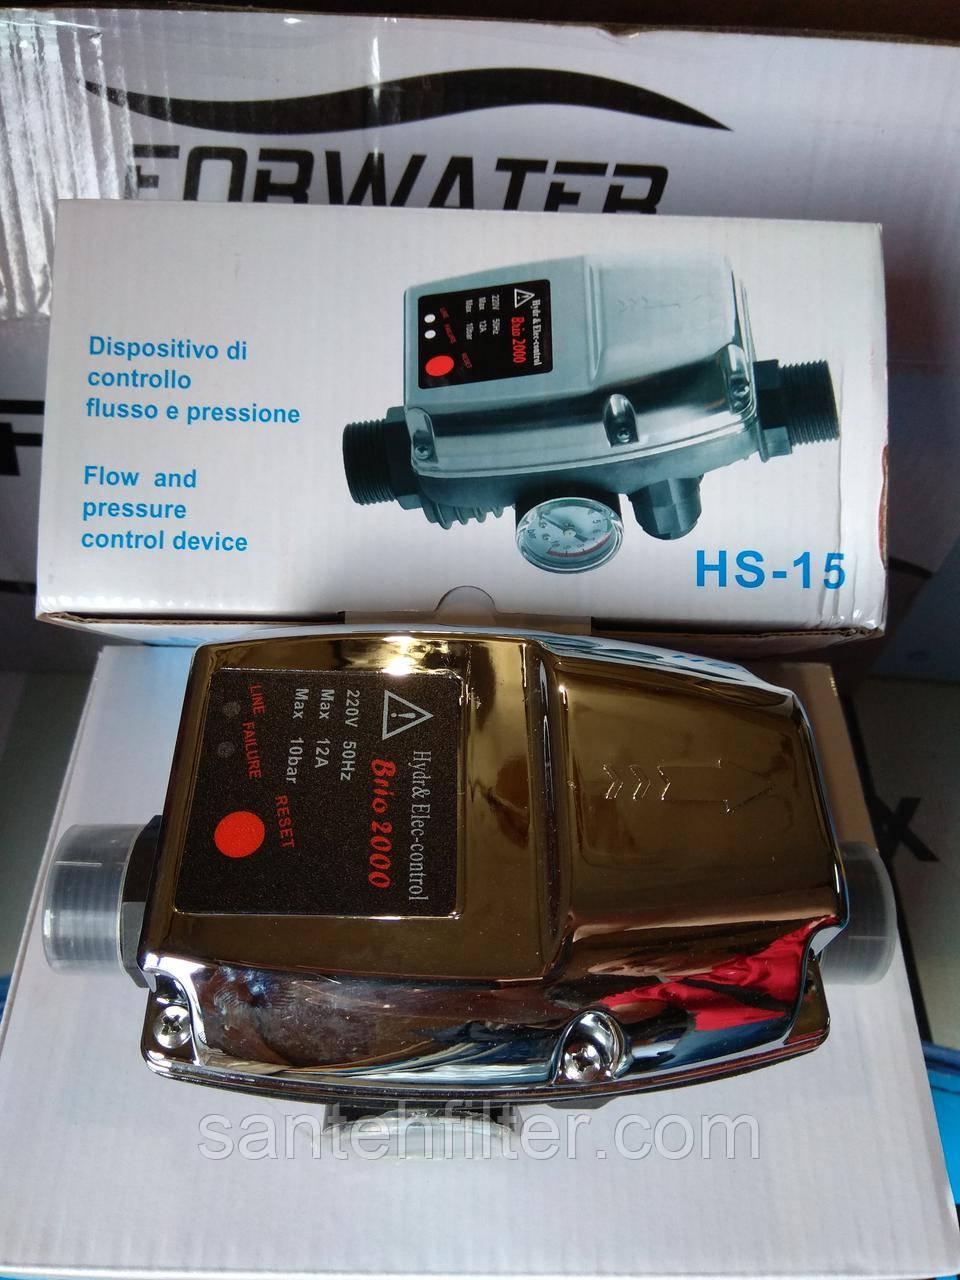 Контролер давления (автоматичний контролер тиску) Форватер HS-15